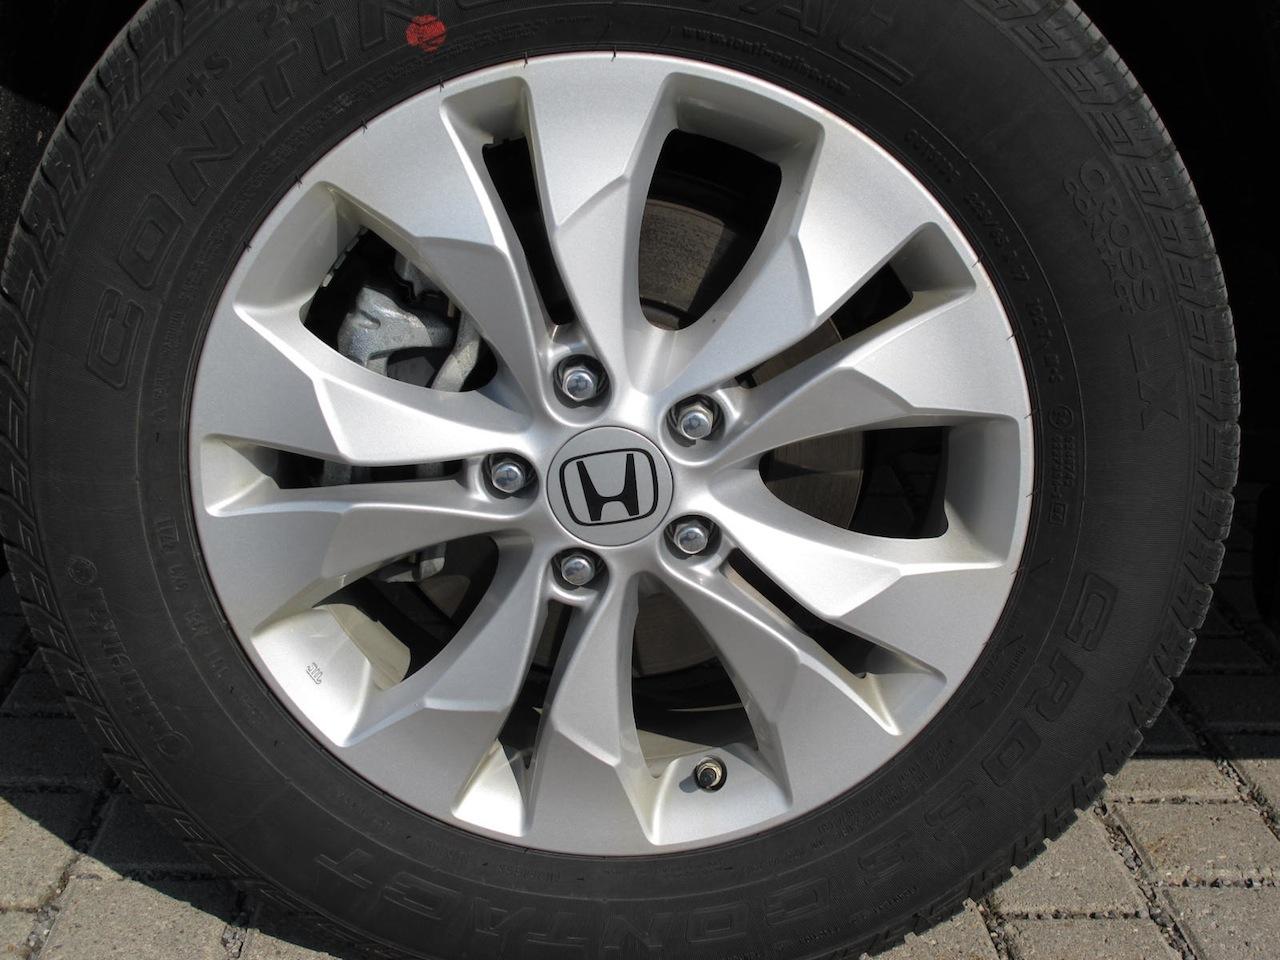 2012 Honda Cr V Touring Photo Gallery Cars Photos Test